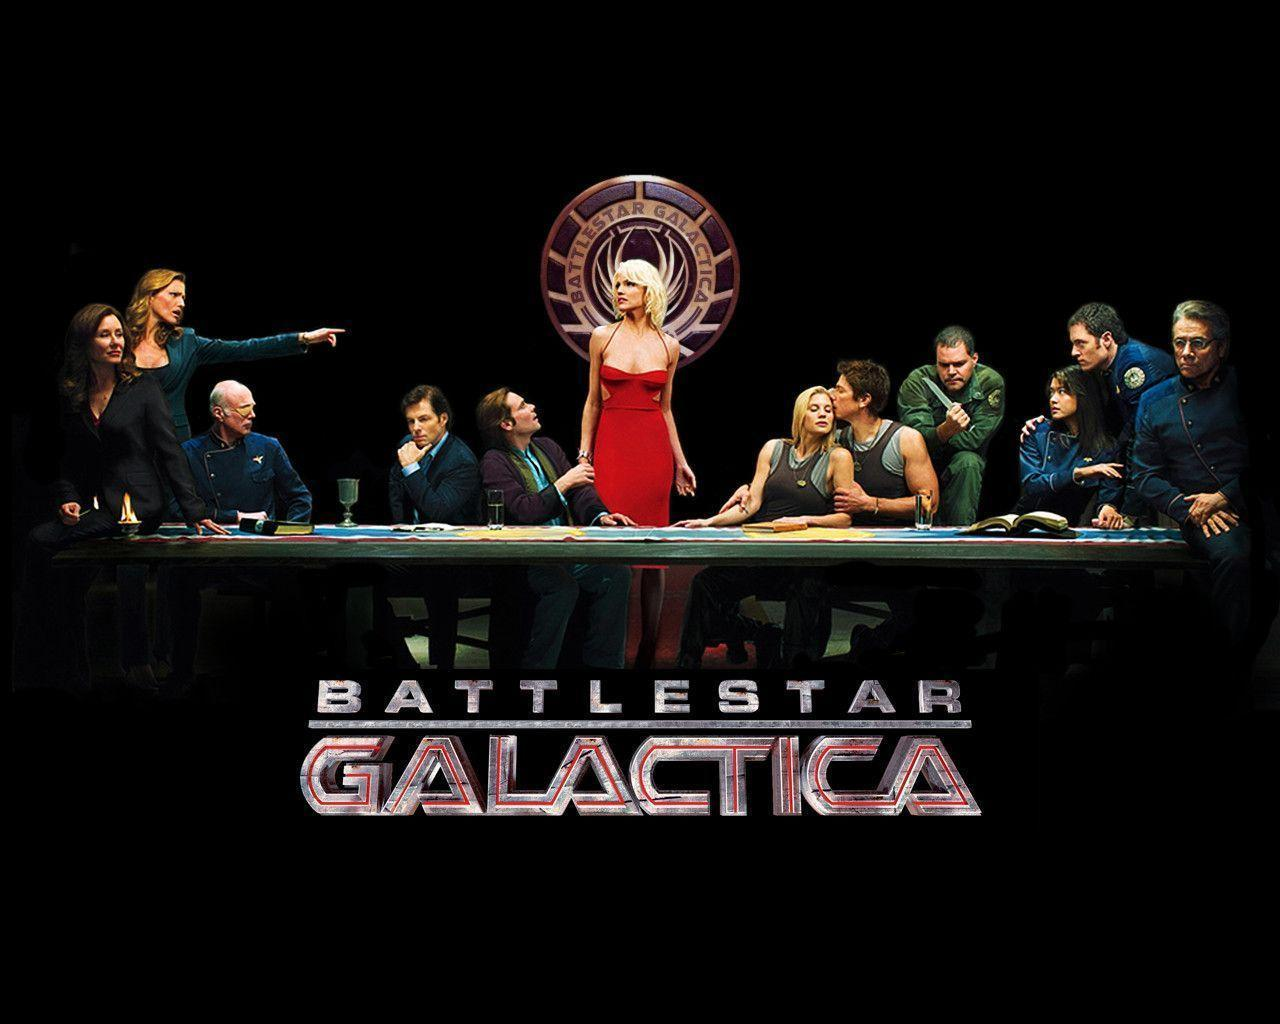 Battlestar Galactica Episodenguide